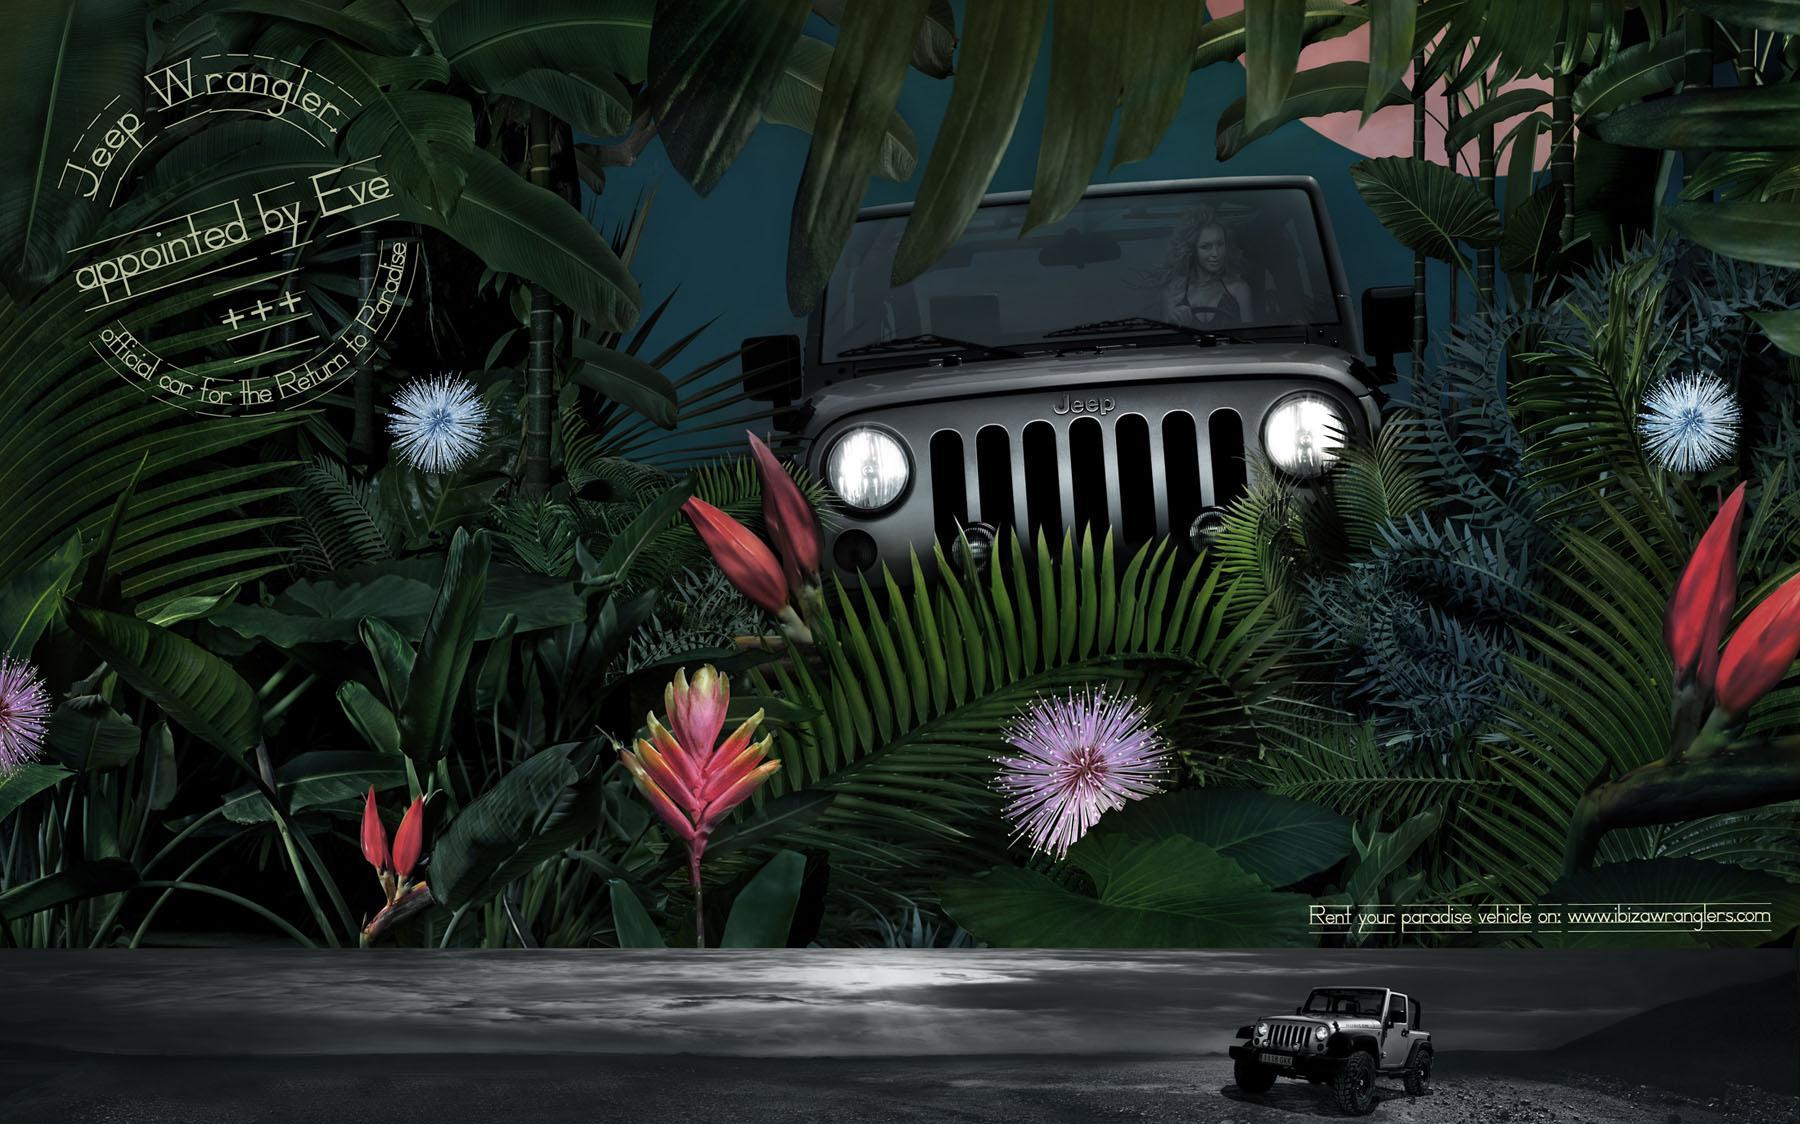 Ibiza Wranglers Print Ad -  Return to Paradise